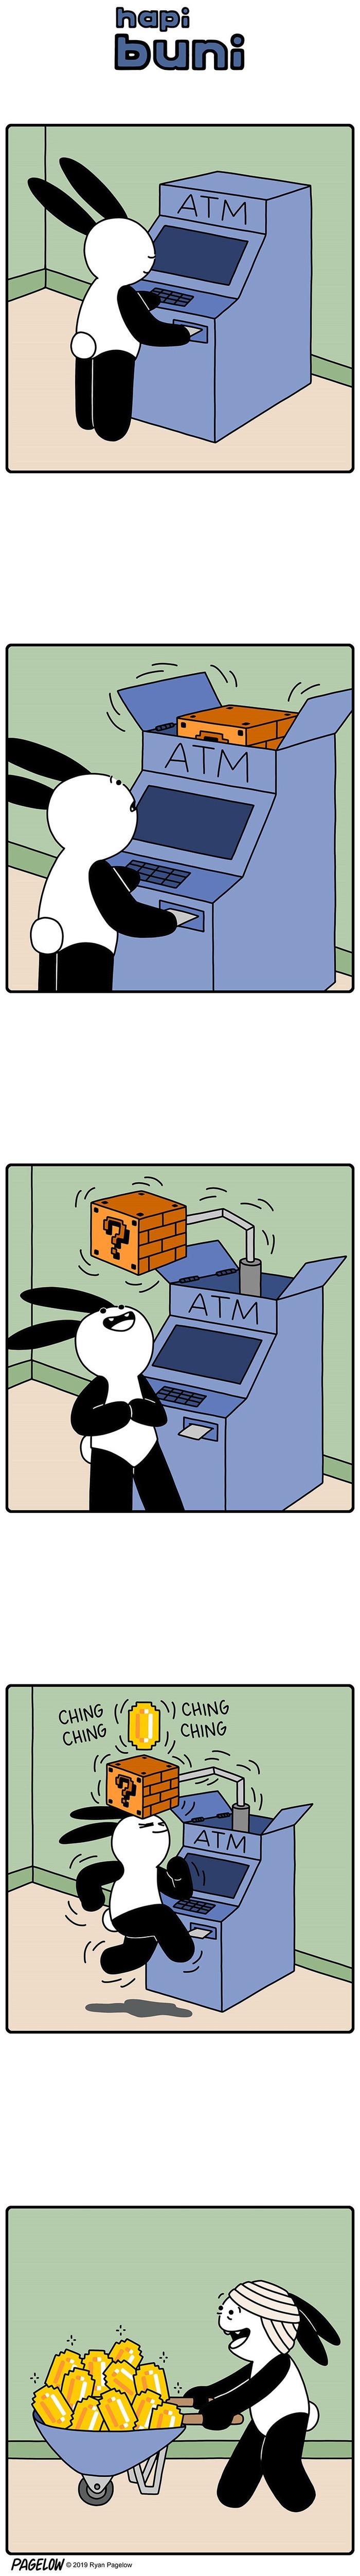 Необычный банкомат Buni, Pagelow, Банкомат, Марио, Комиксы, Длиннопост